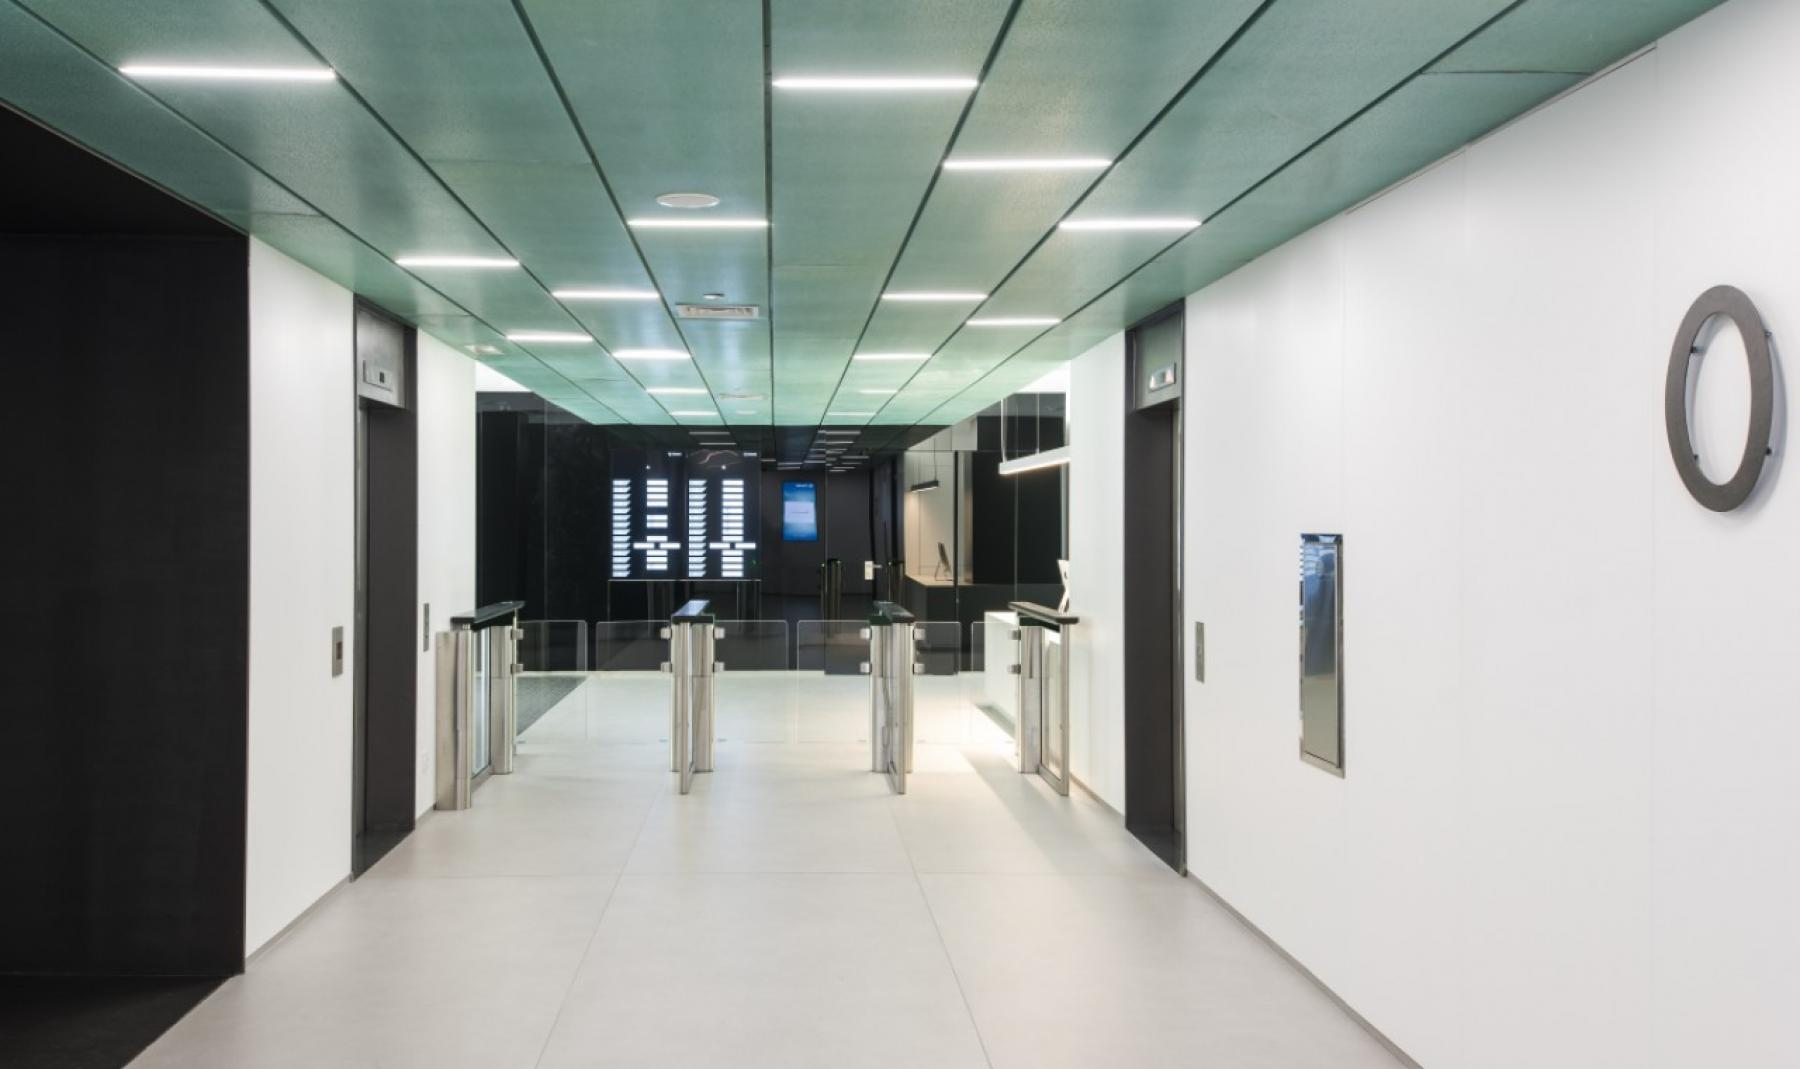 Alquilar oficinas Diagonal , Barcelona (5)